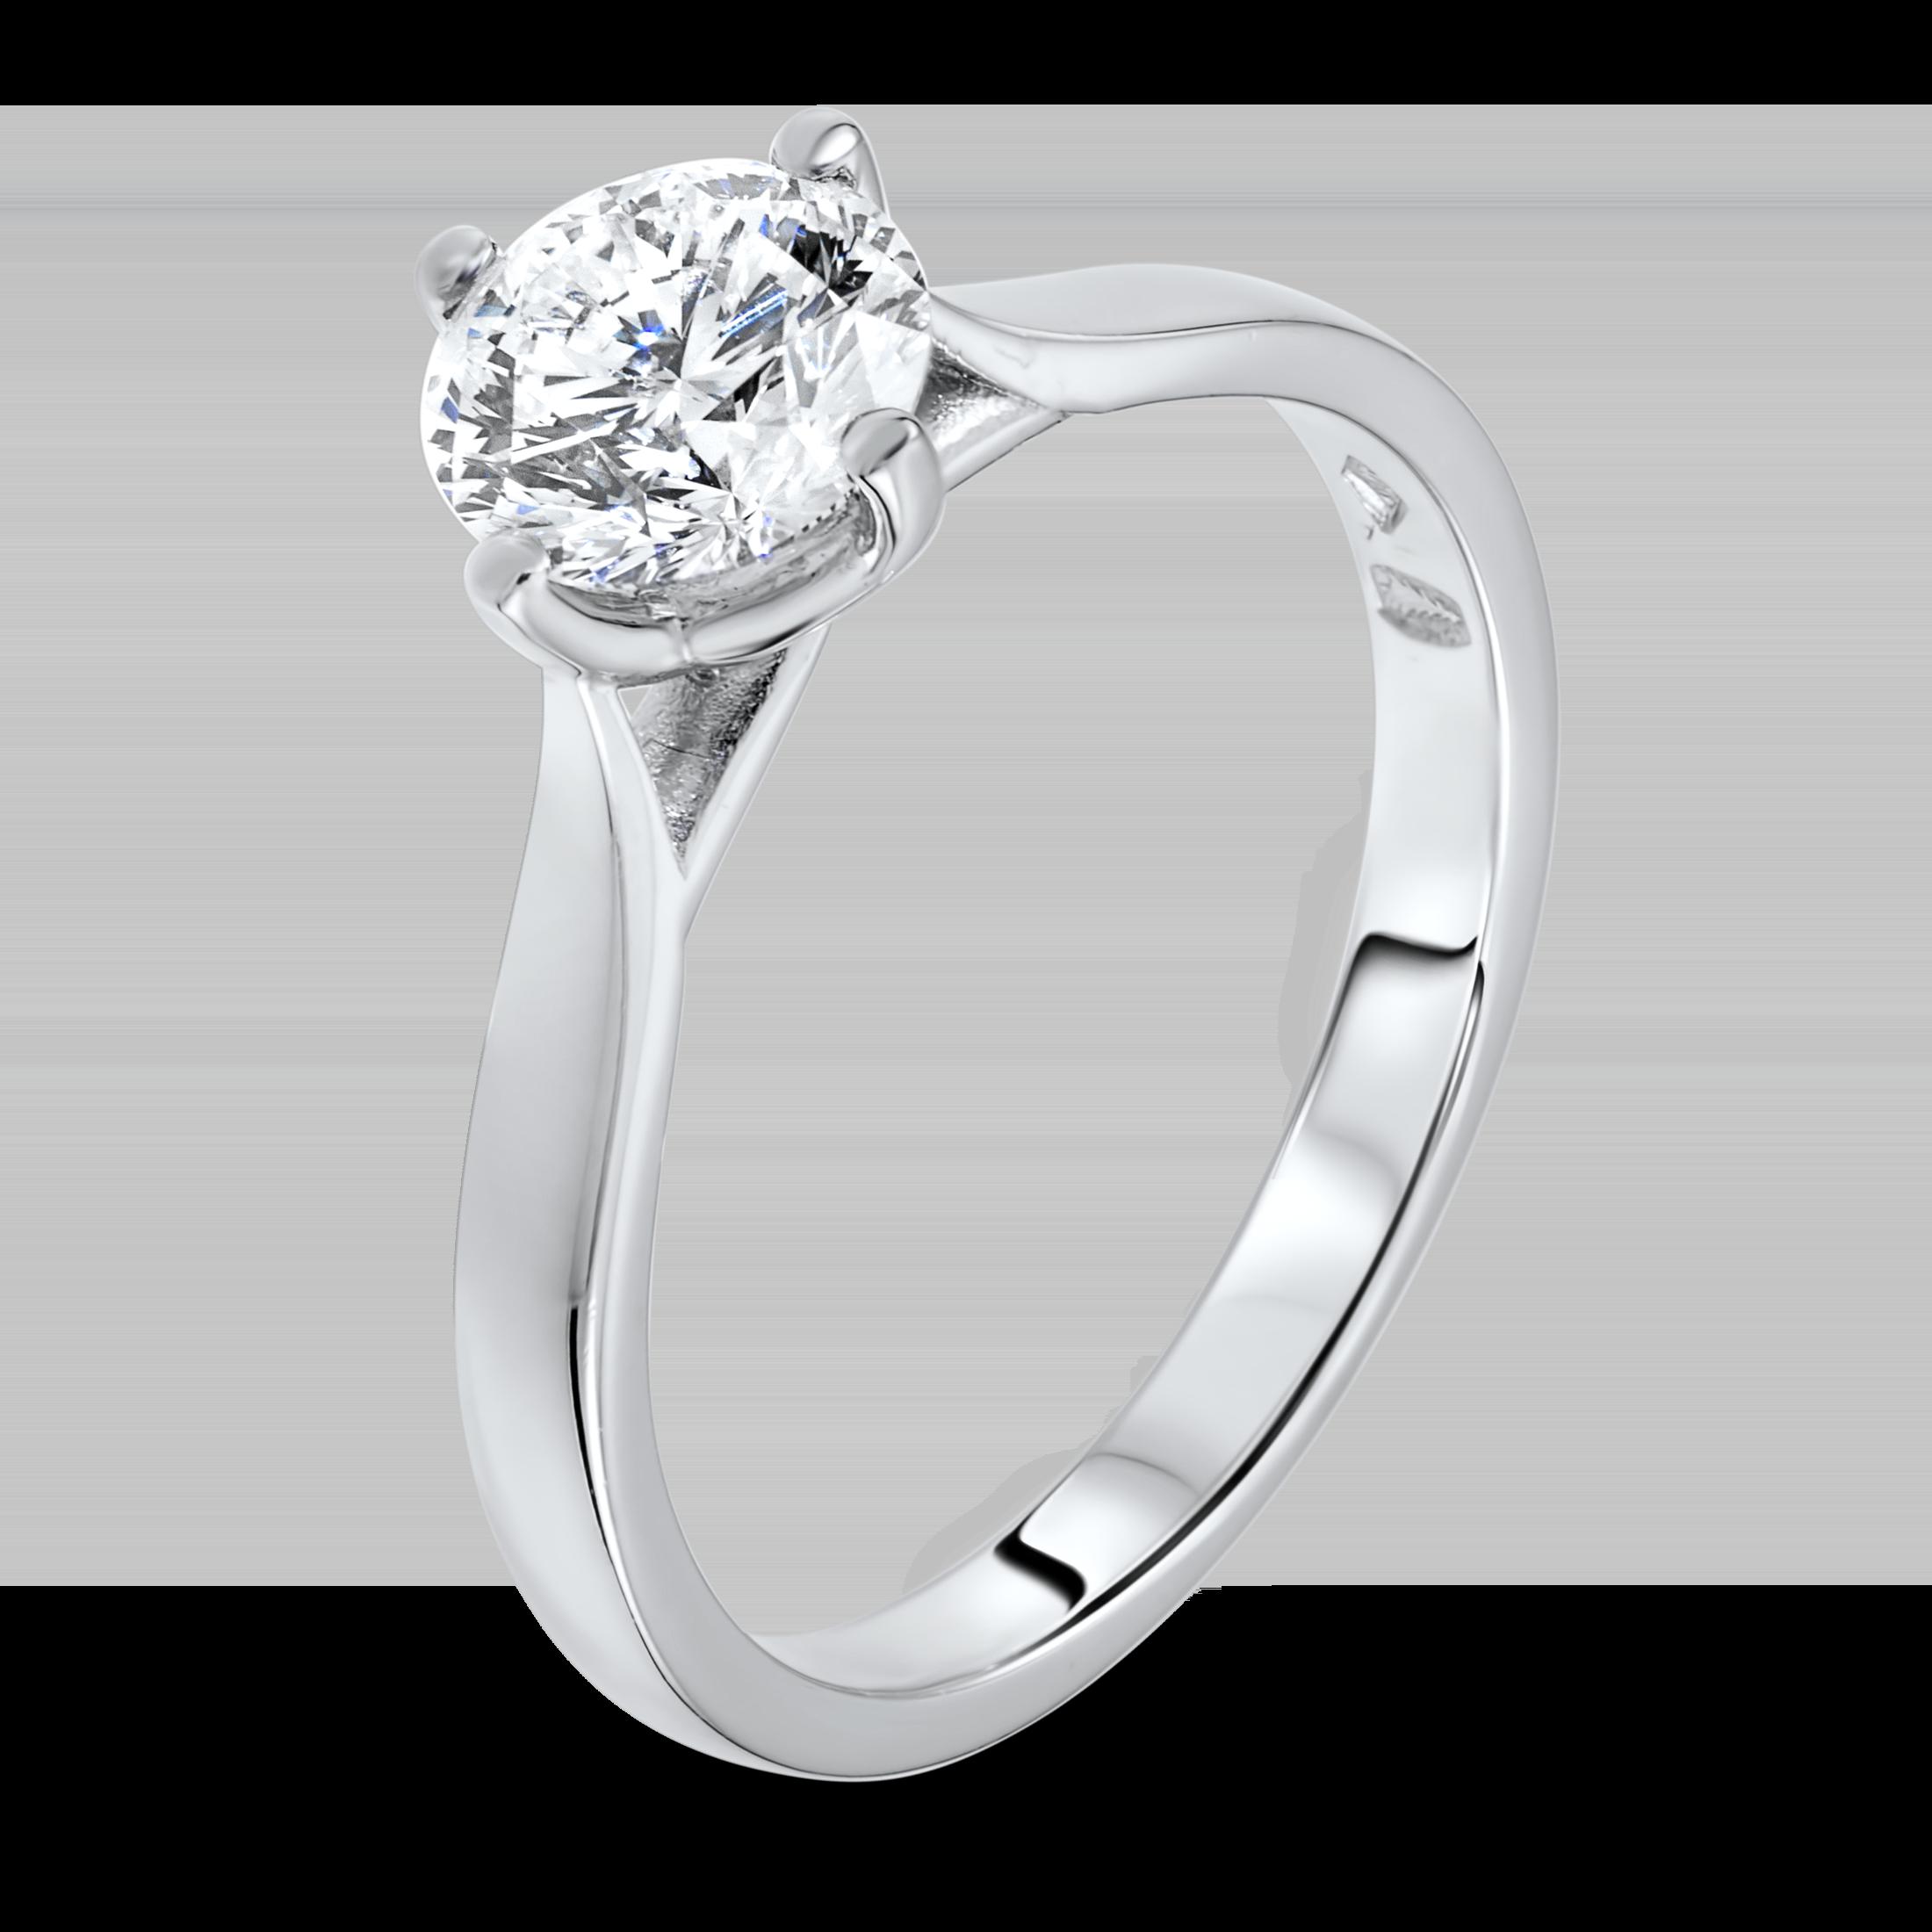 1.03 carat diamond ring.